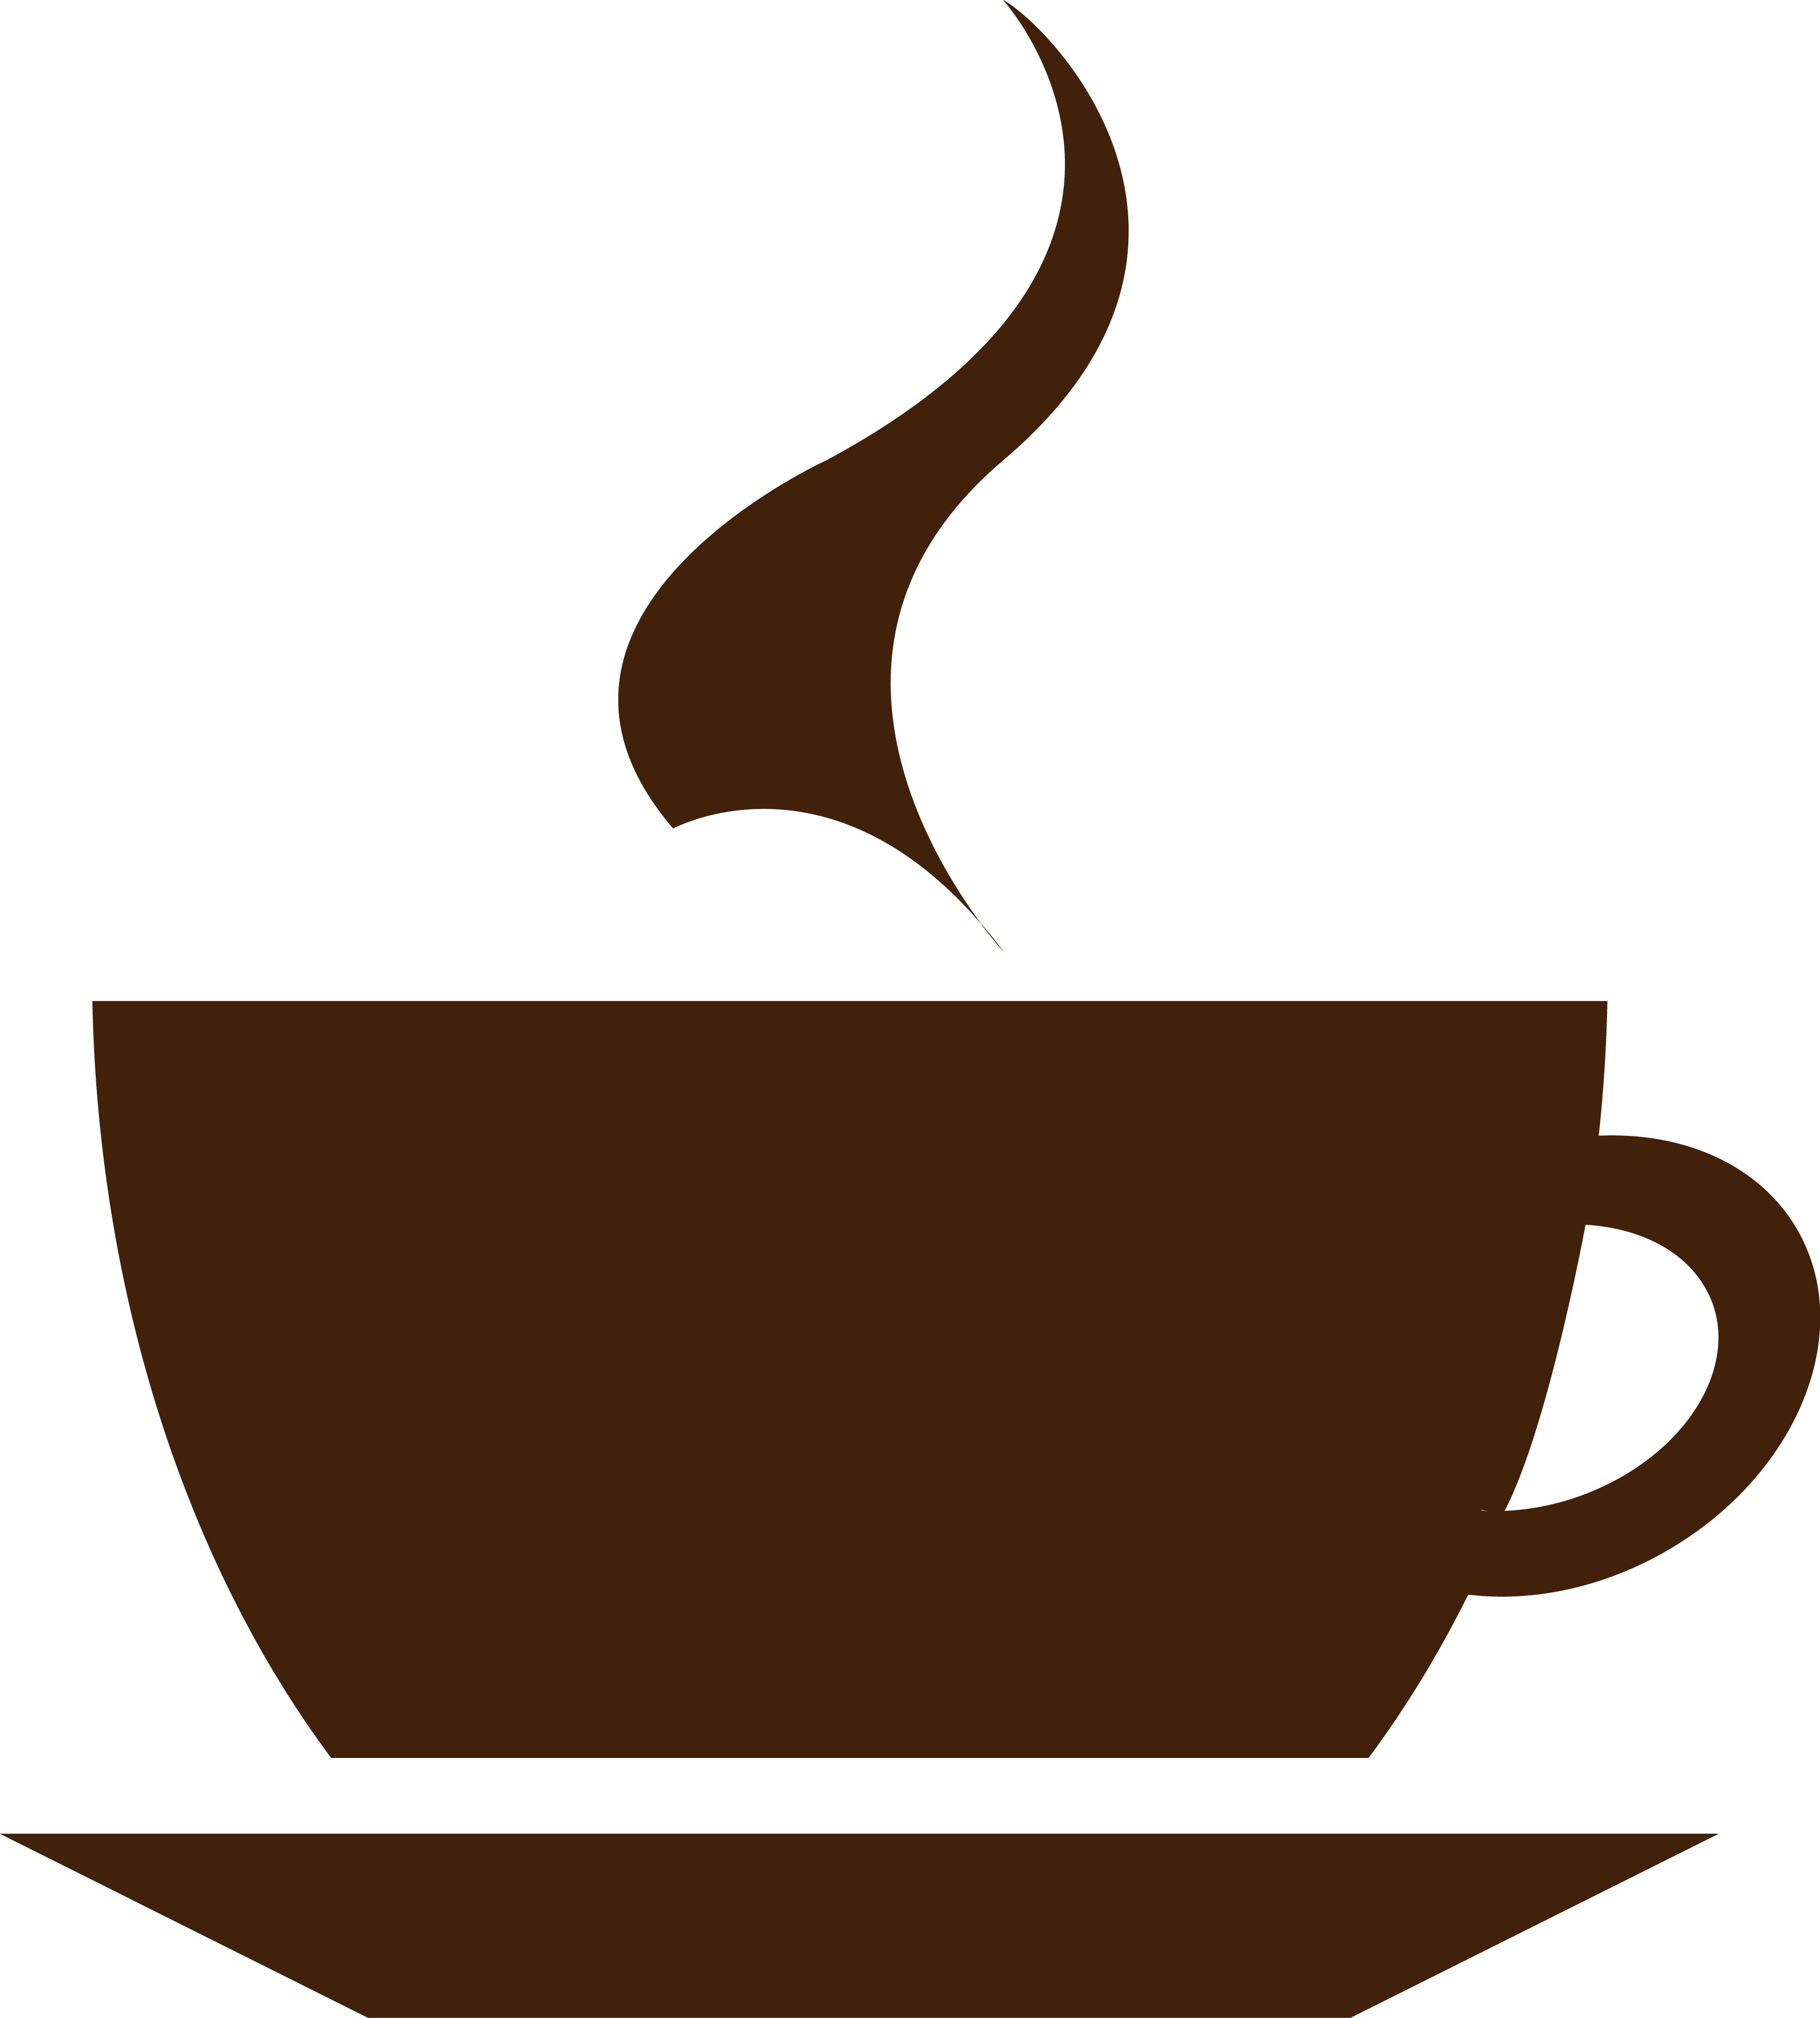 Clipart coffee espresso. Iced cafe logo simple